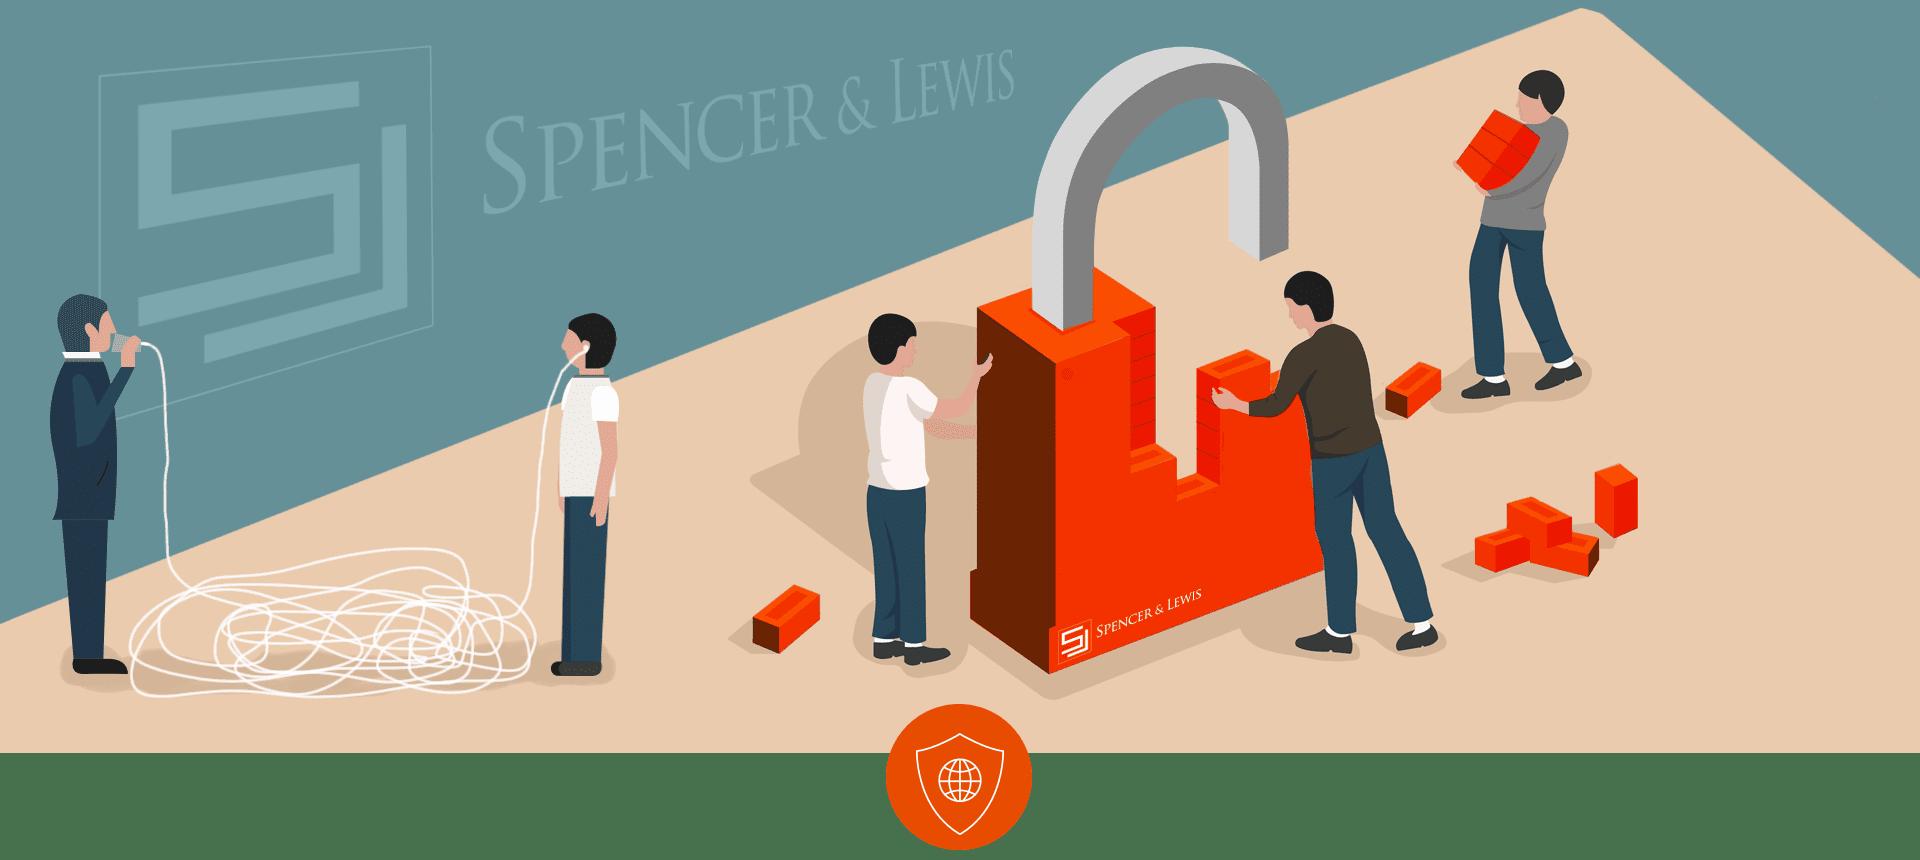 Cybersecurity - Brand Reputation